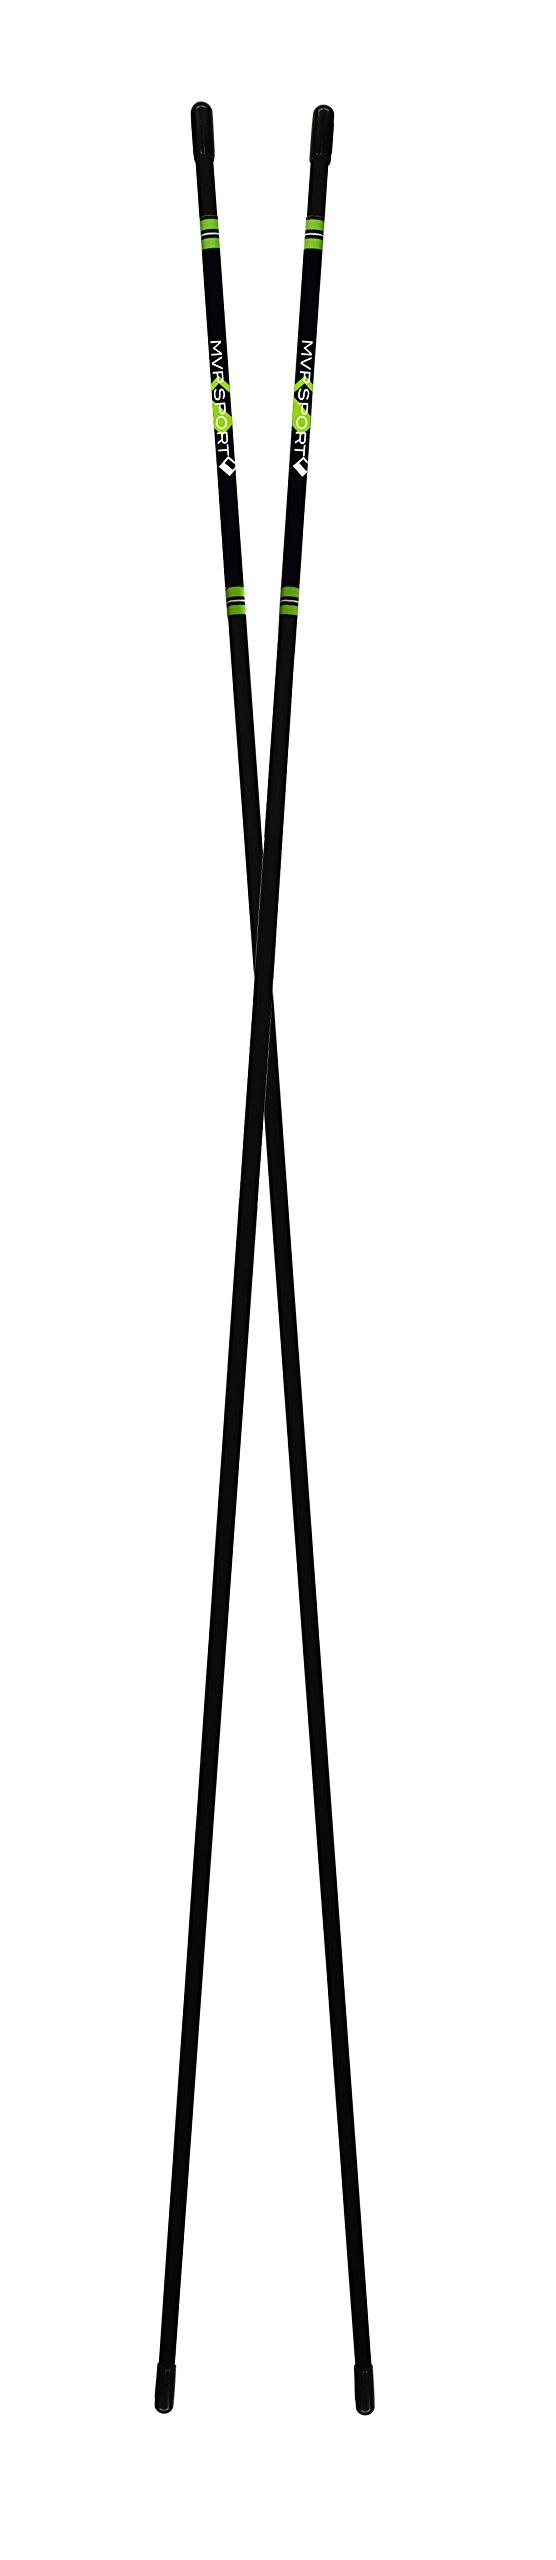 MVP Sport Golf Alignment Rods (MorodZ) Training Aid 2-Pack (Blue) by MVP Sport